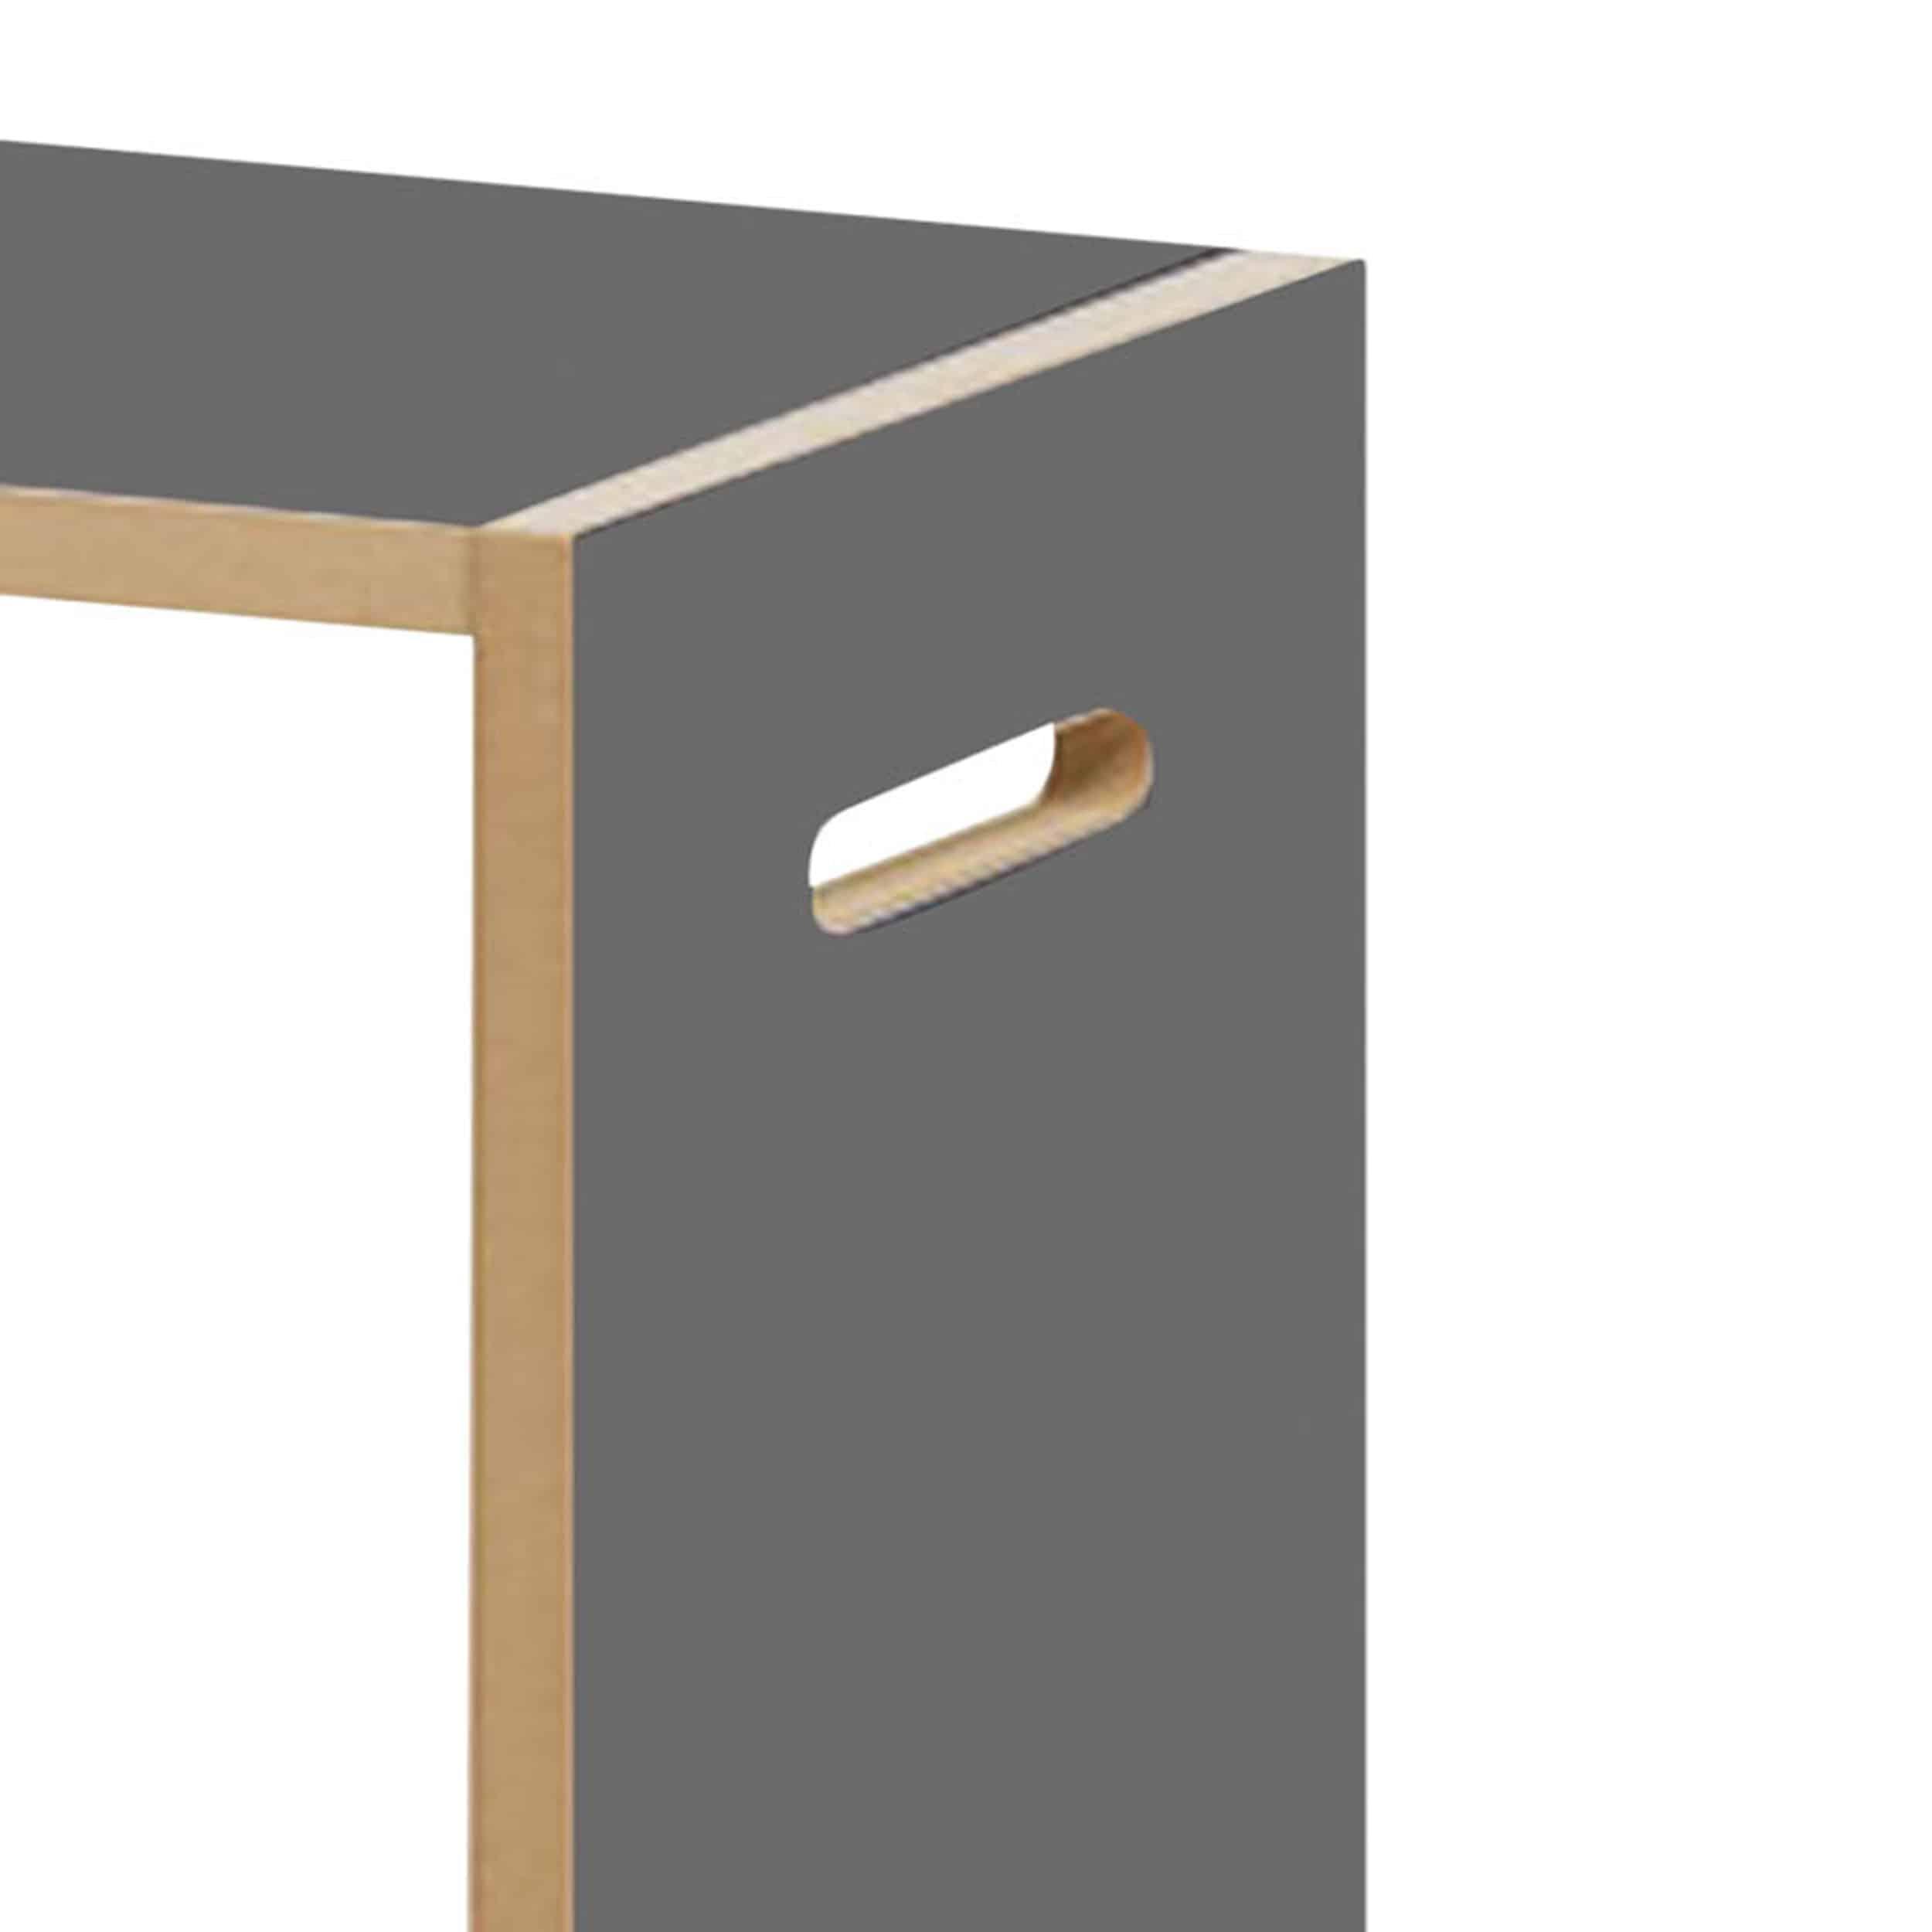 Tojo-hochstapler Anbauelement mit Türen